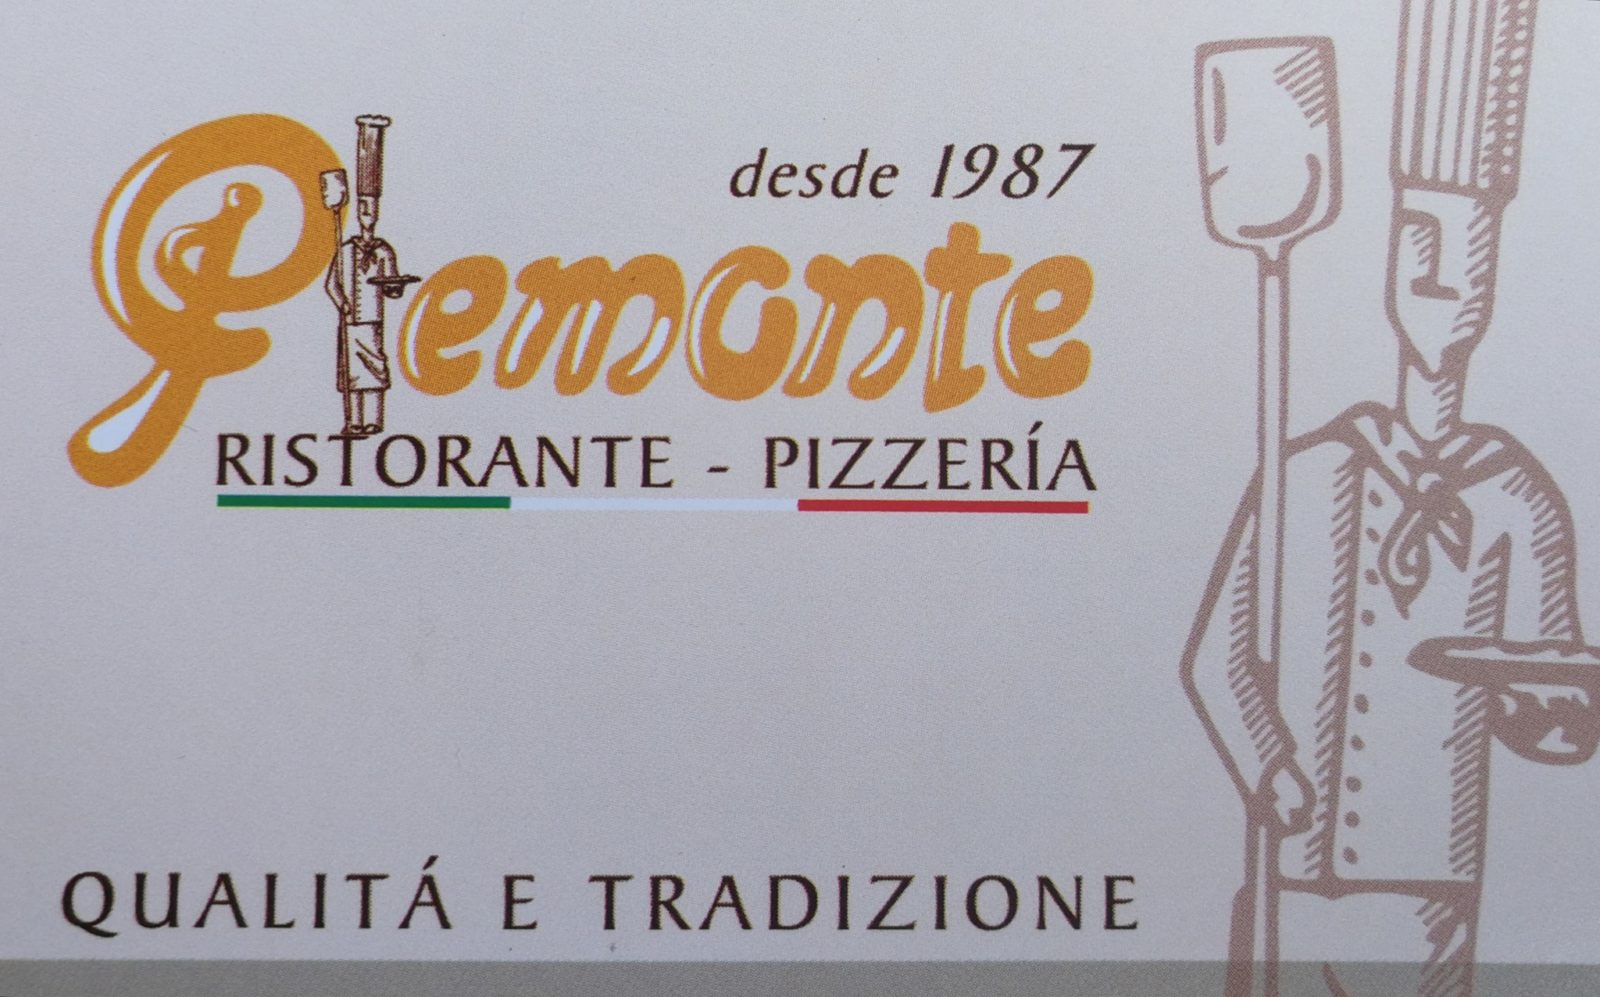 Ristorante Piemonte